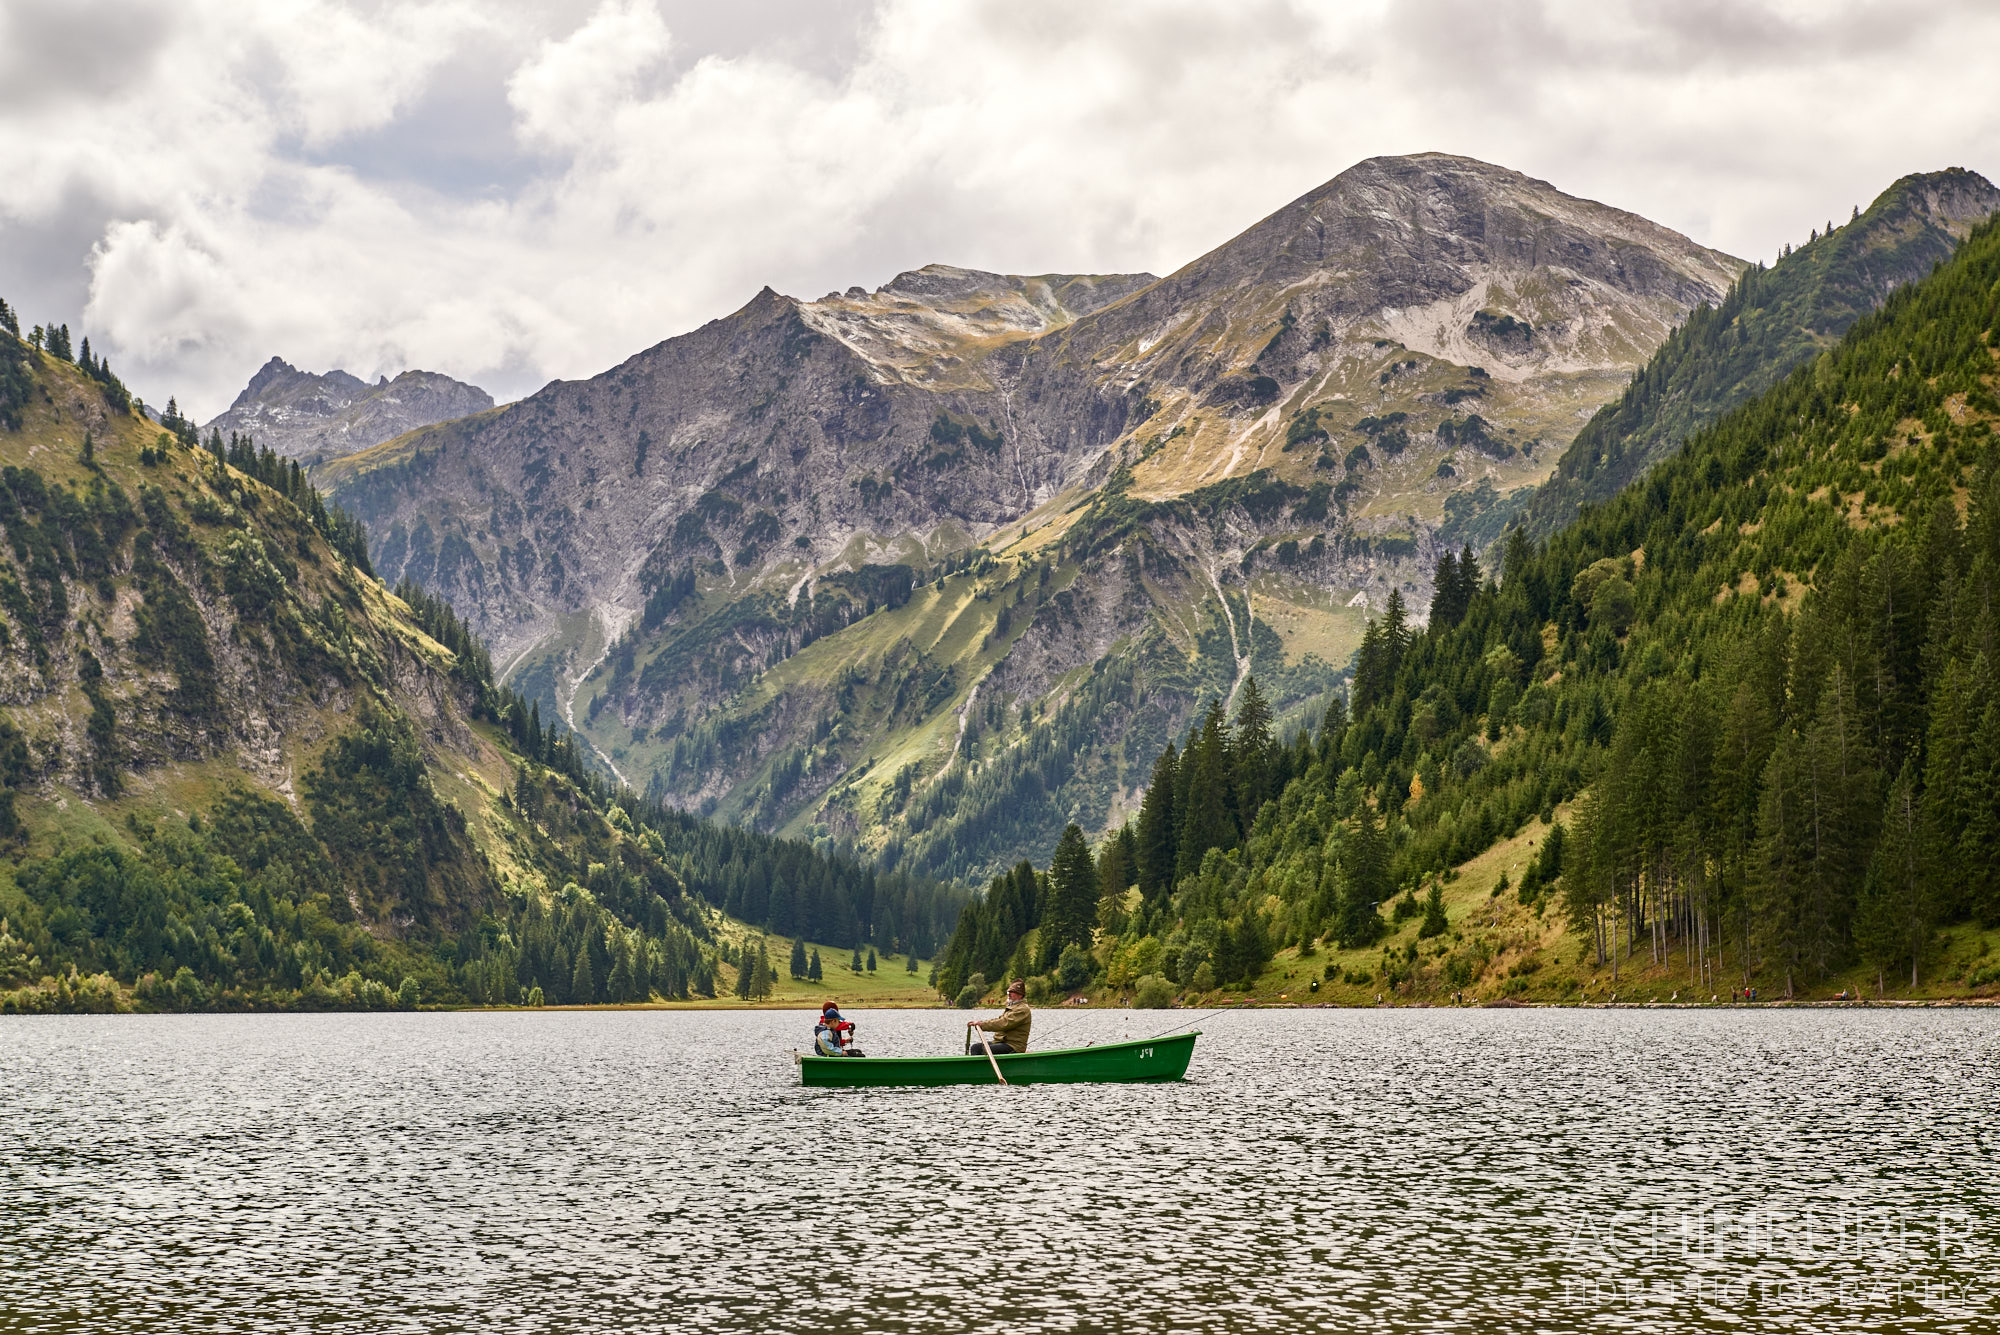 Angeln auf dem Vilsalpsee, Tannheimertal, Tirol, Österreich by AchimMeurer.com                     .